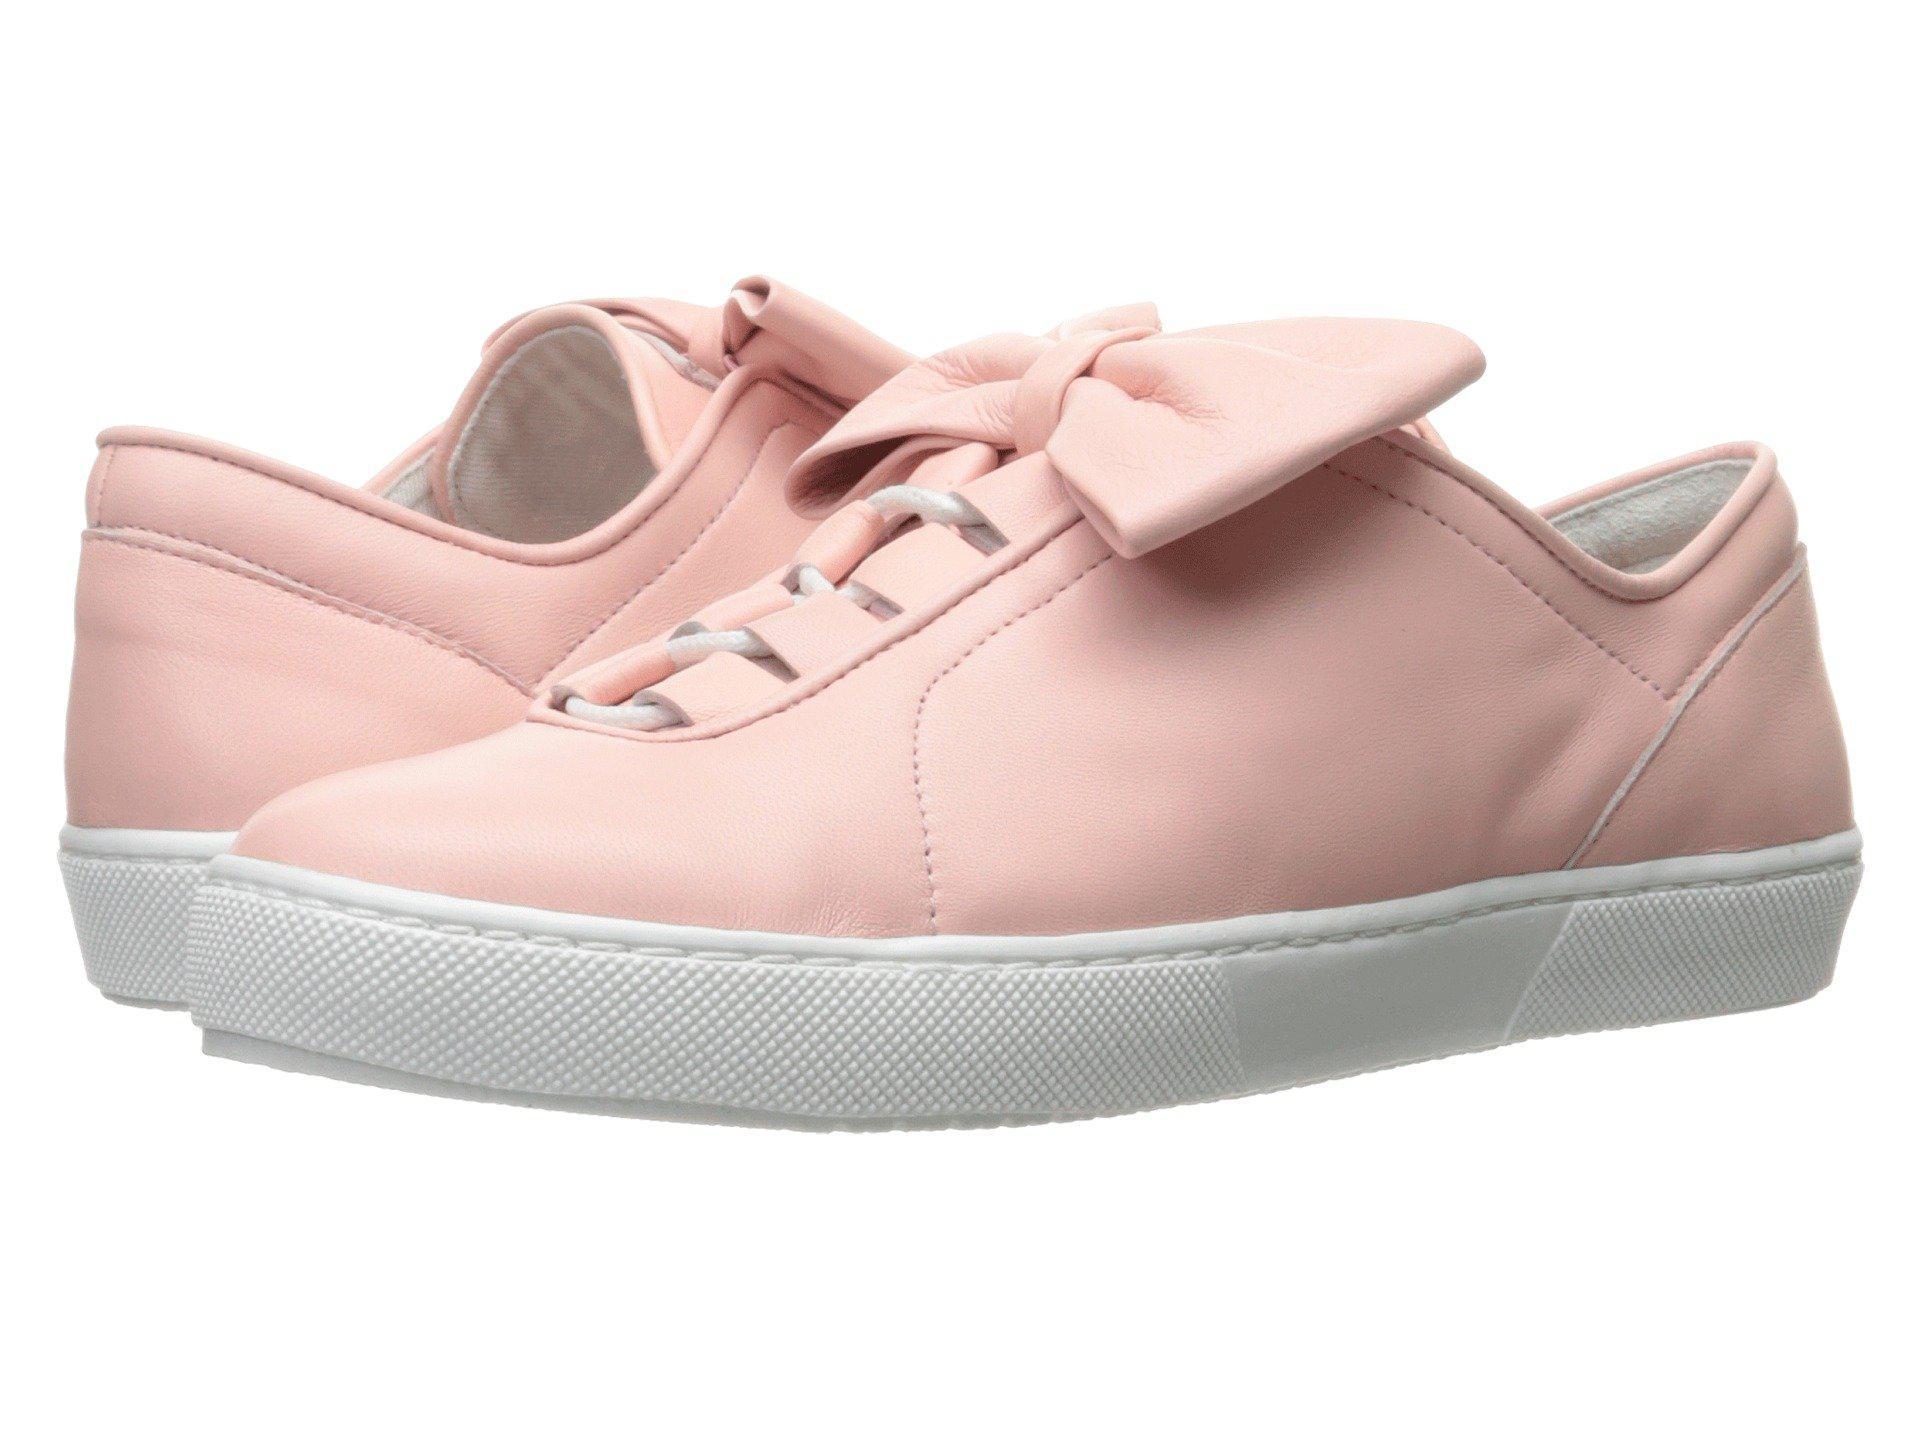 Boutique Moschino Tropique Glisser Sur Chaussures De Sport Meilleur Magasin Pas Cher Pour Obtenir Mastercard Acheter Pas Cher Profiter FrxJvJyKN